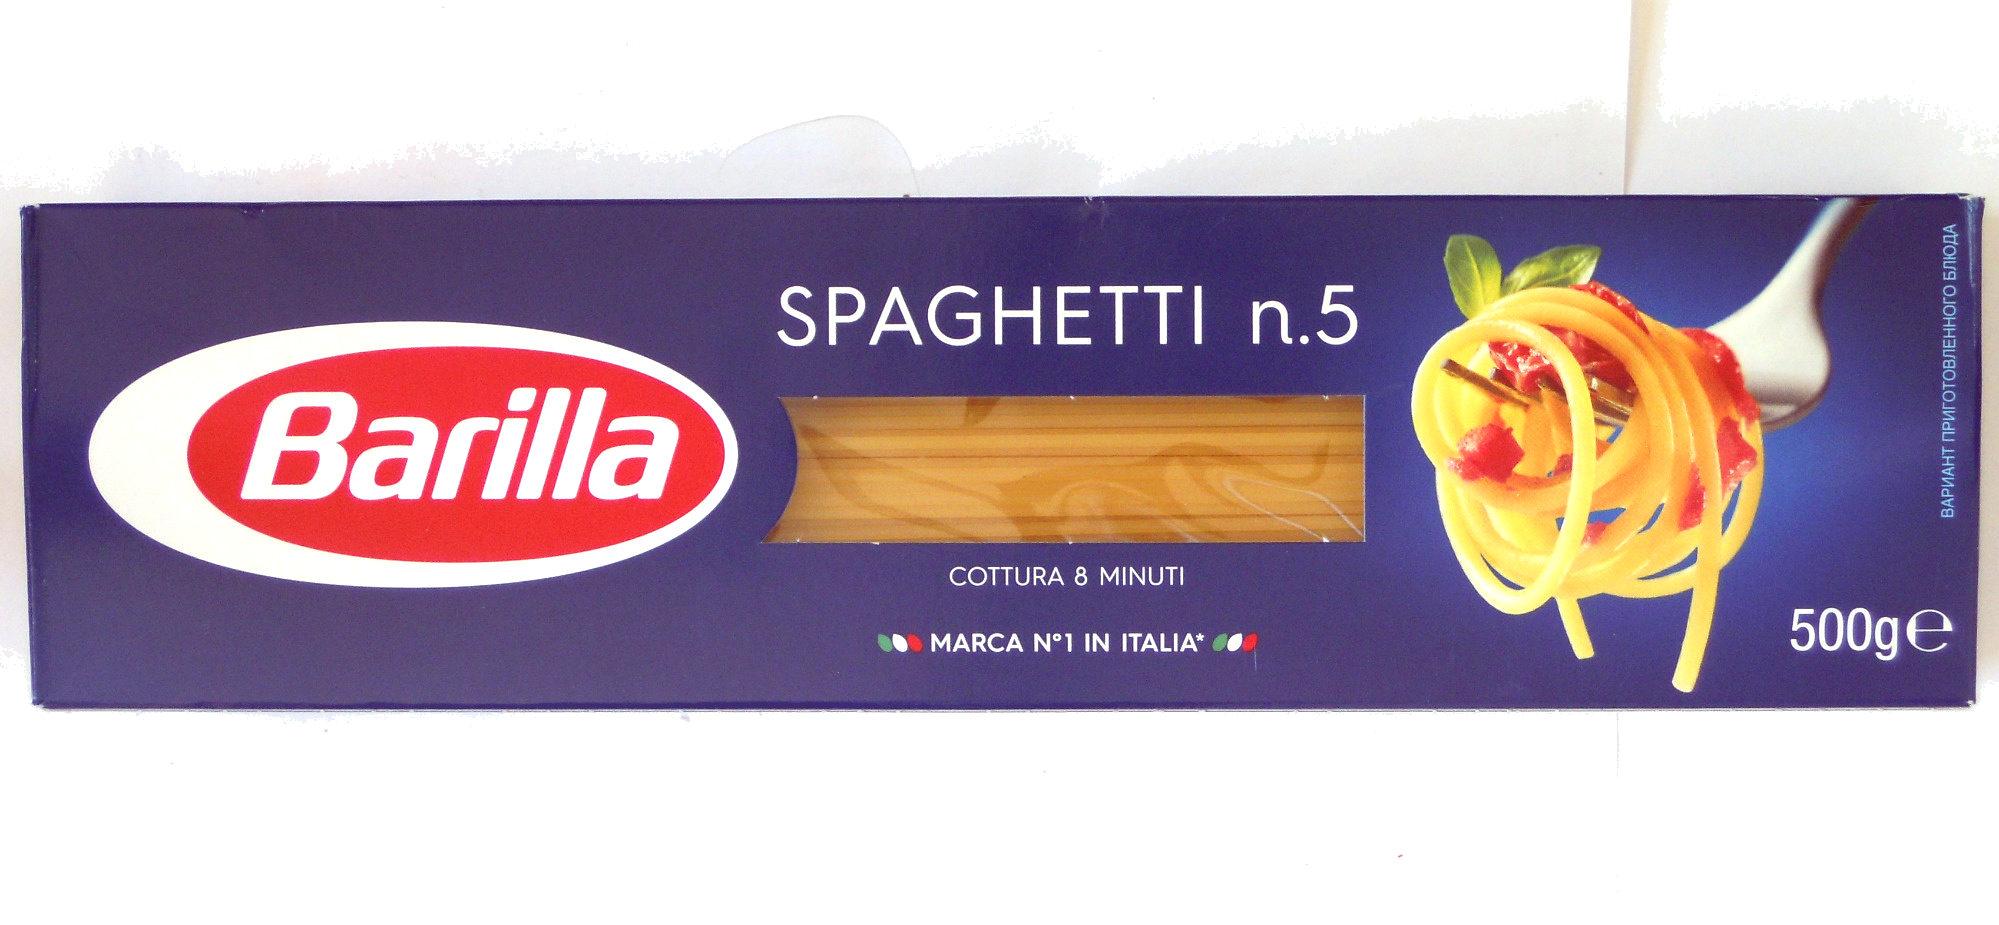 Spaghetti n. 5  Barilla - Продукт